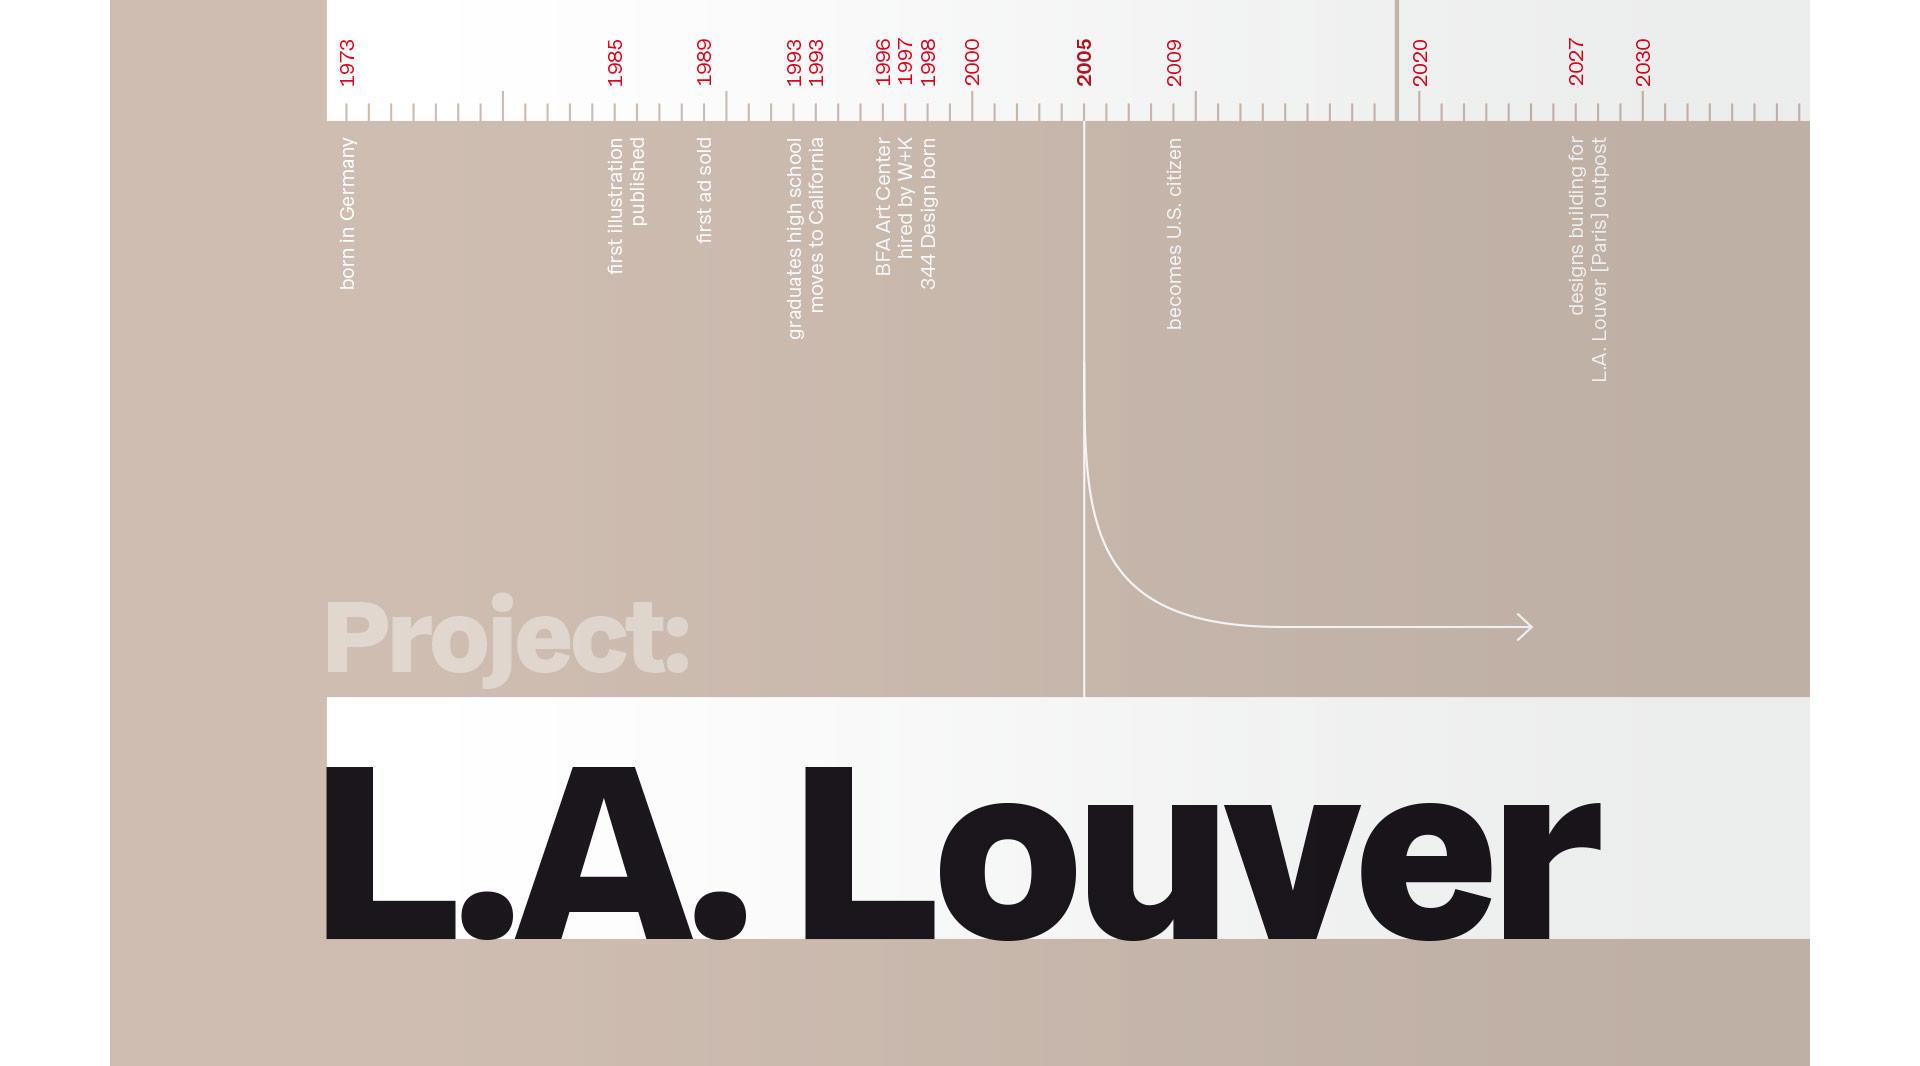 nda-book-spread-la-louver-detail@2x.jpg